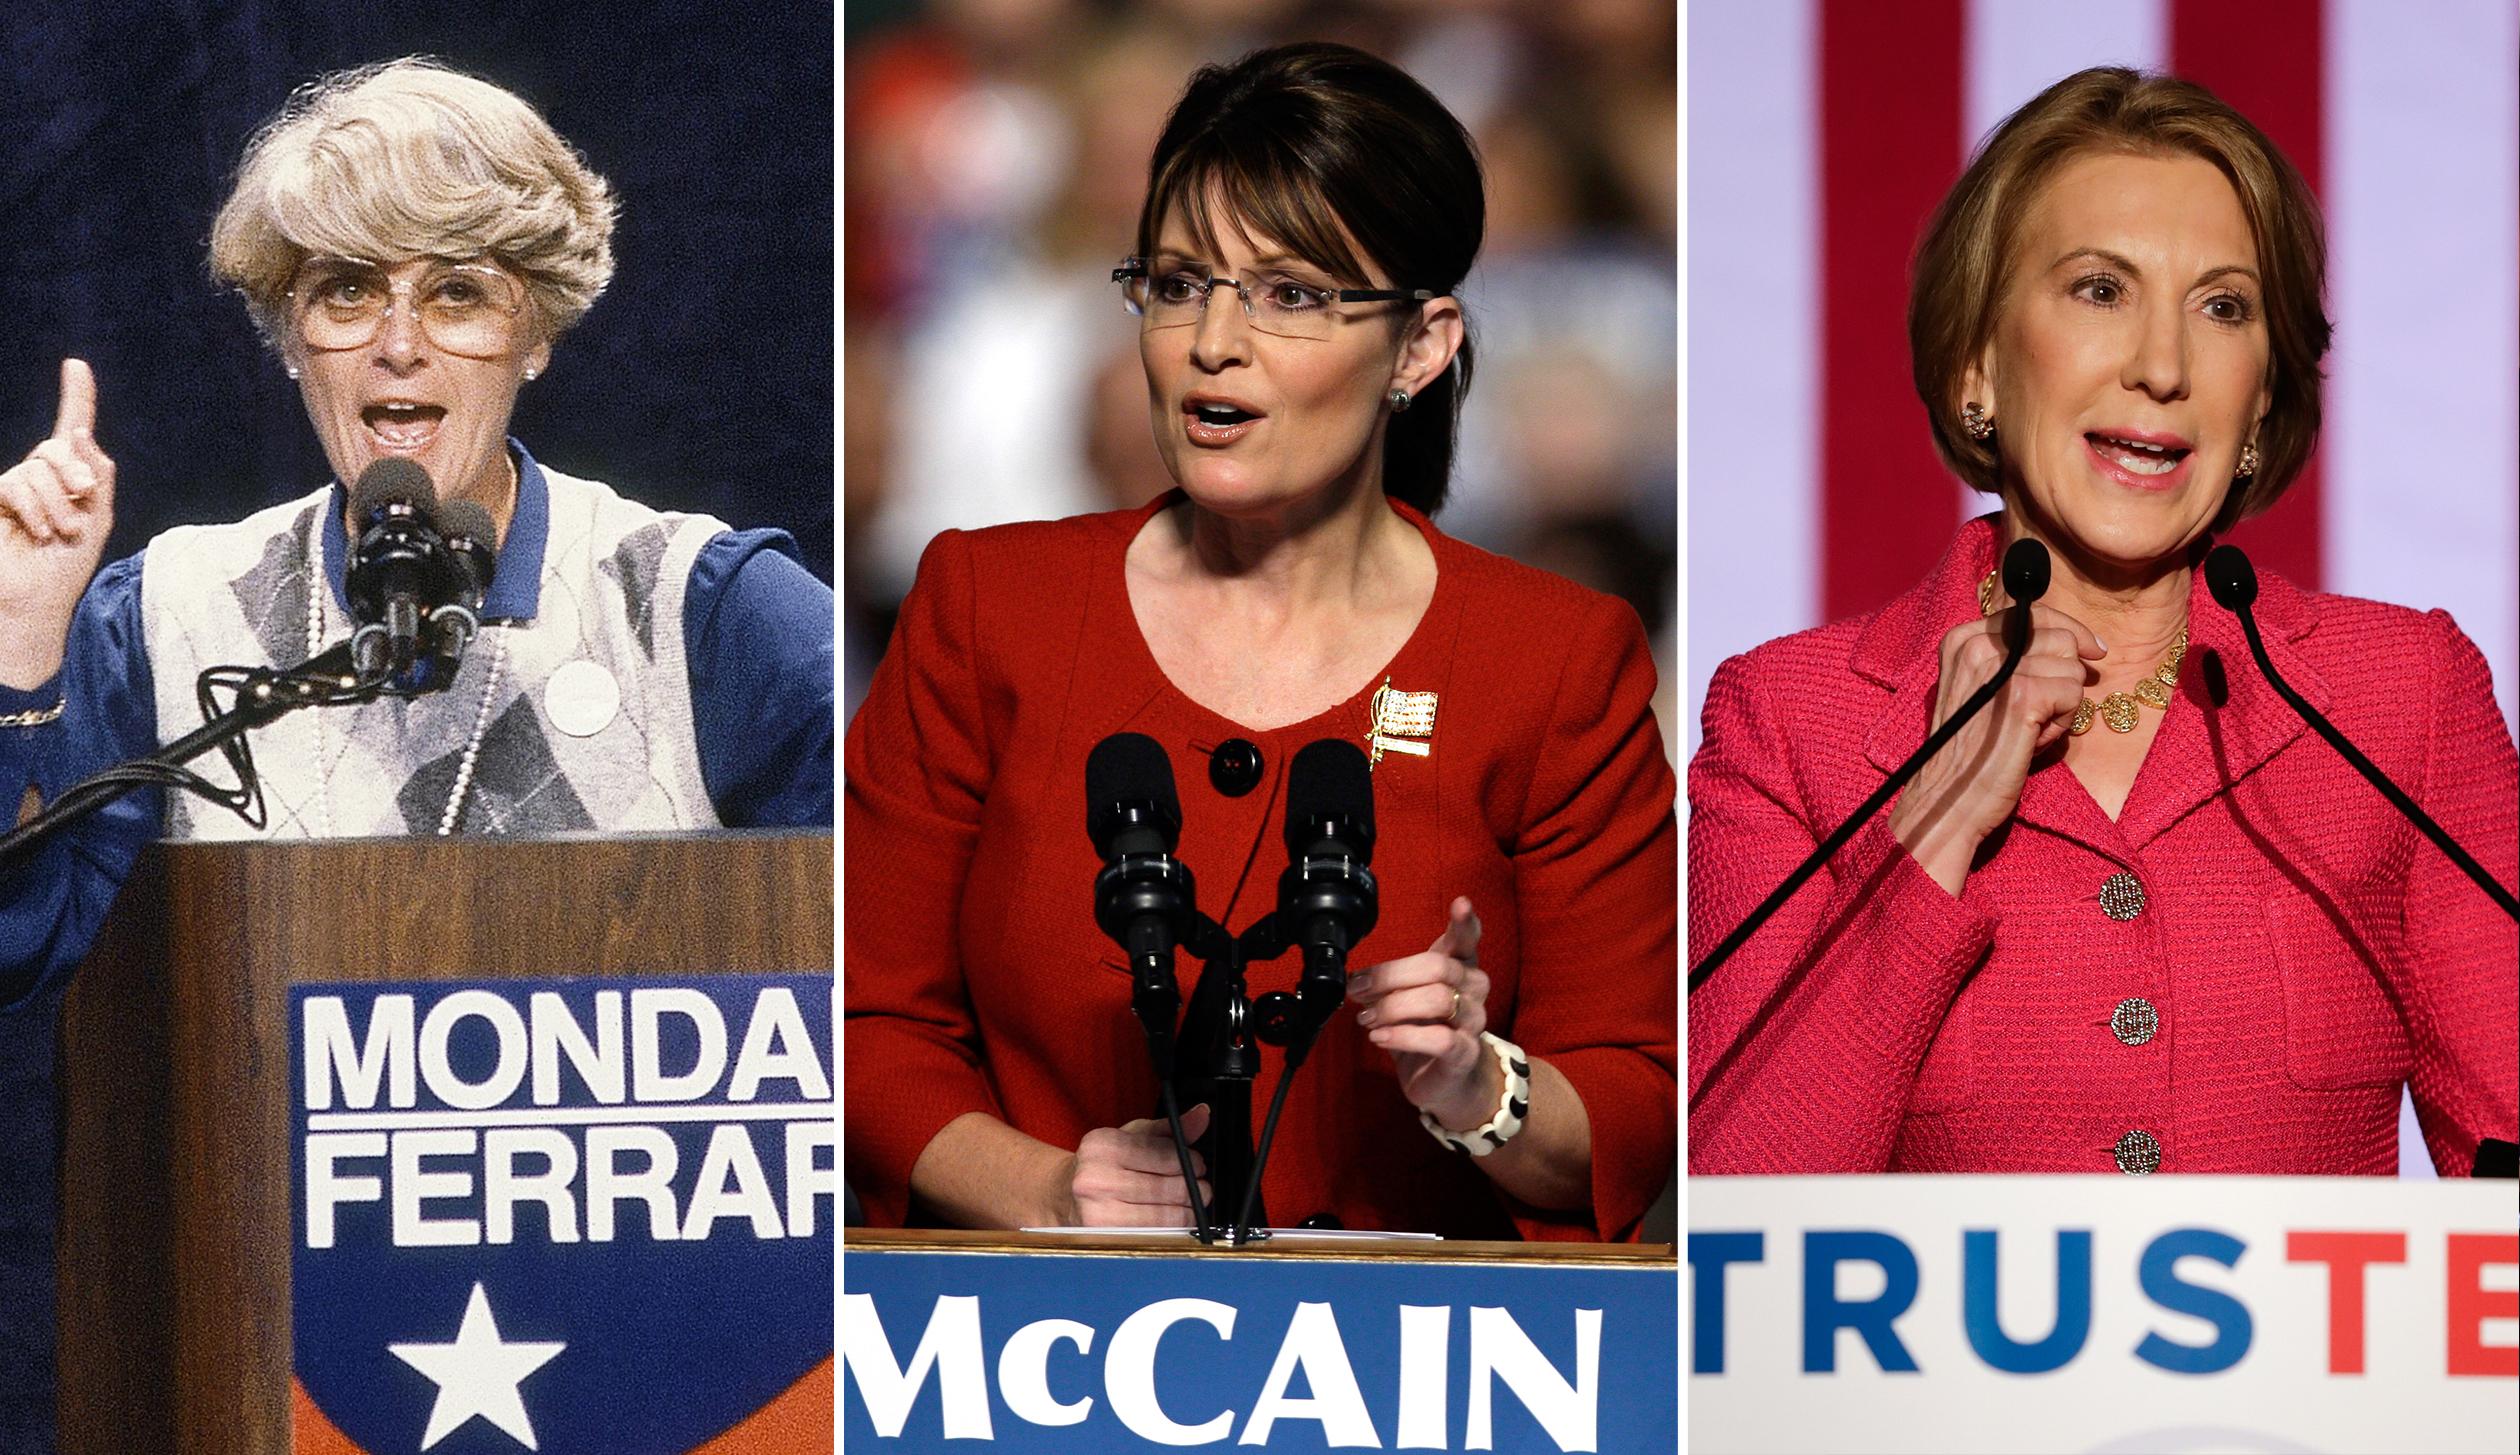 Geraldine Ferraro, left, Sarah Palin and Carly Fiorina.